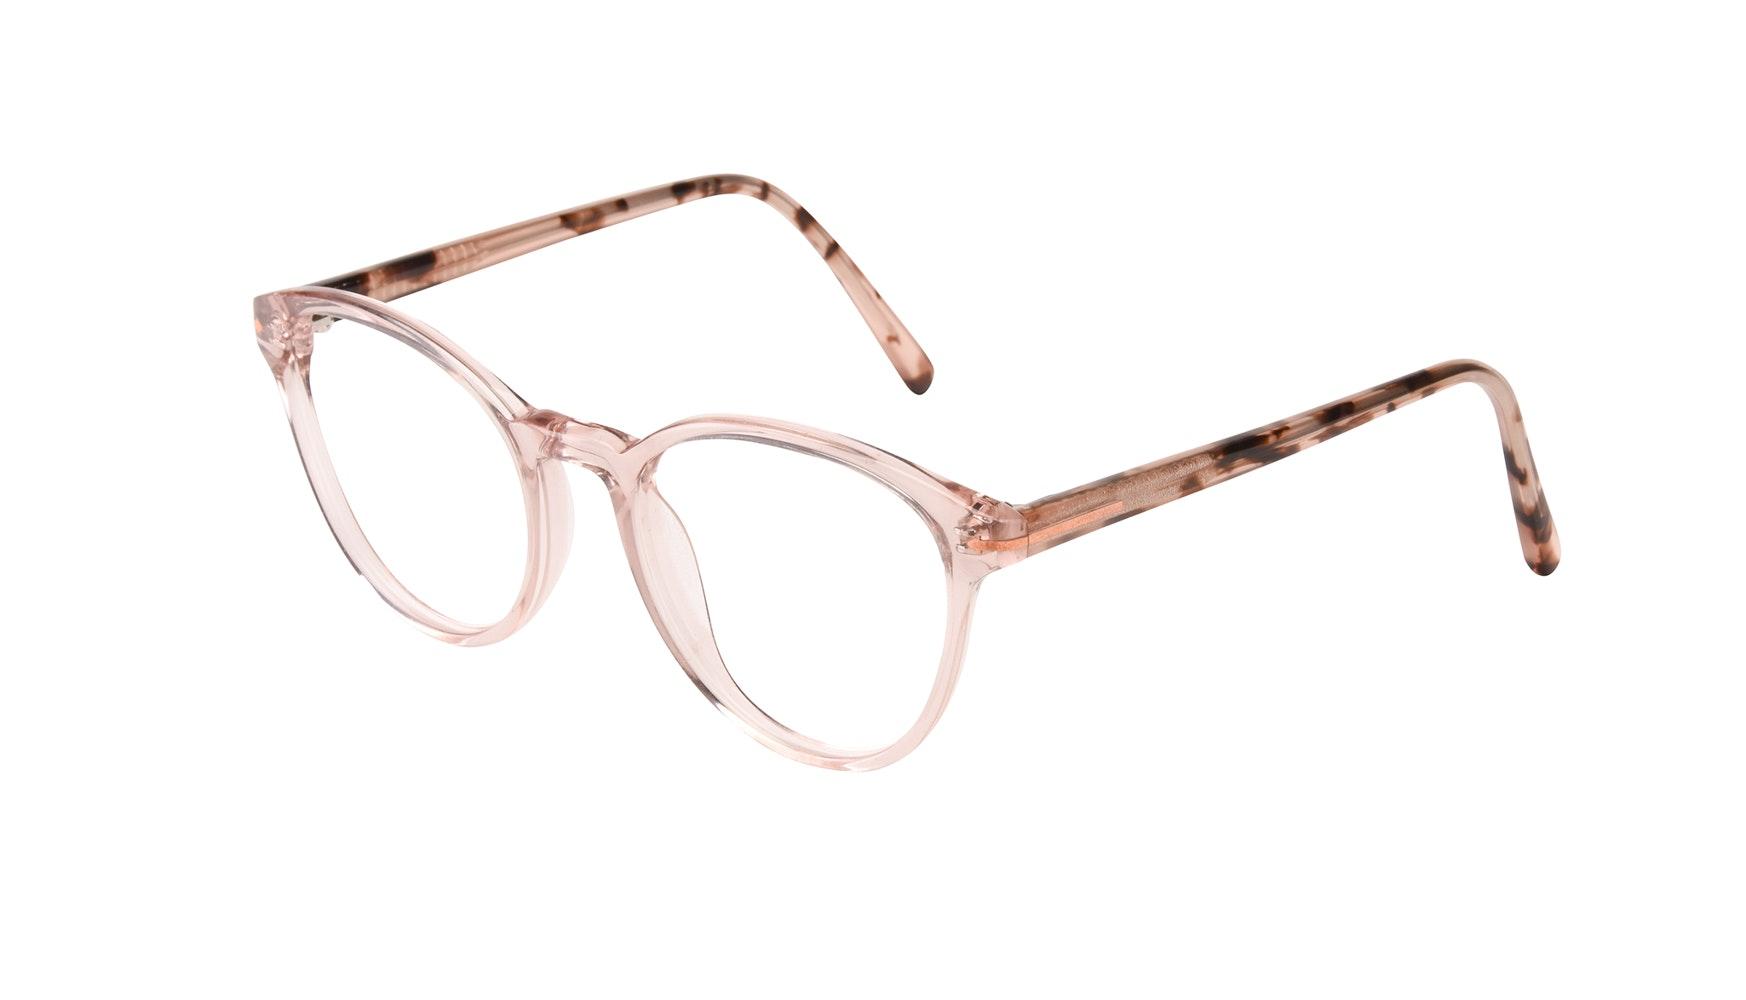 Affordable Fashion Glasses Round Eyeglasses Women London Blush Tilt